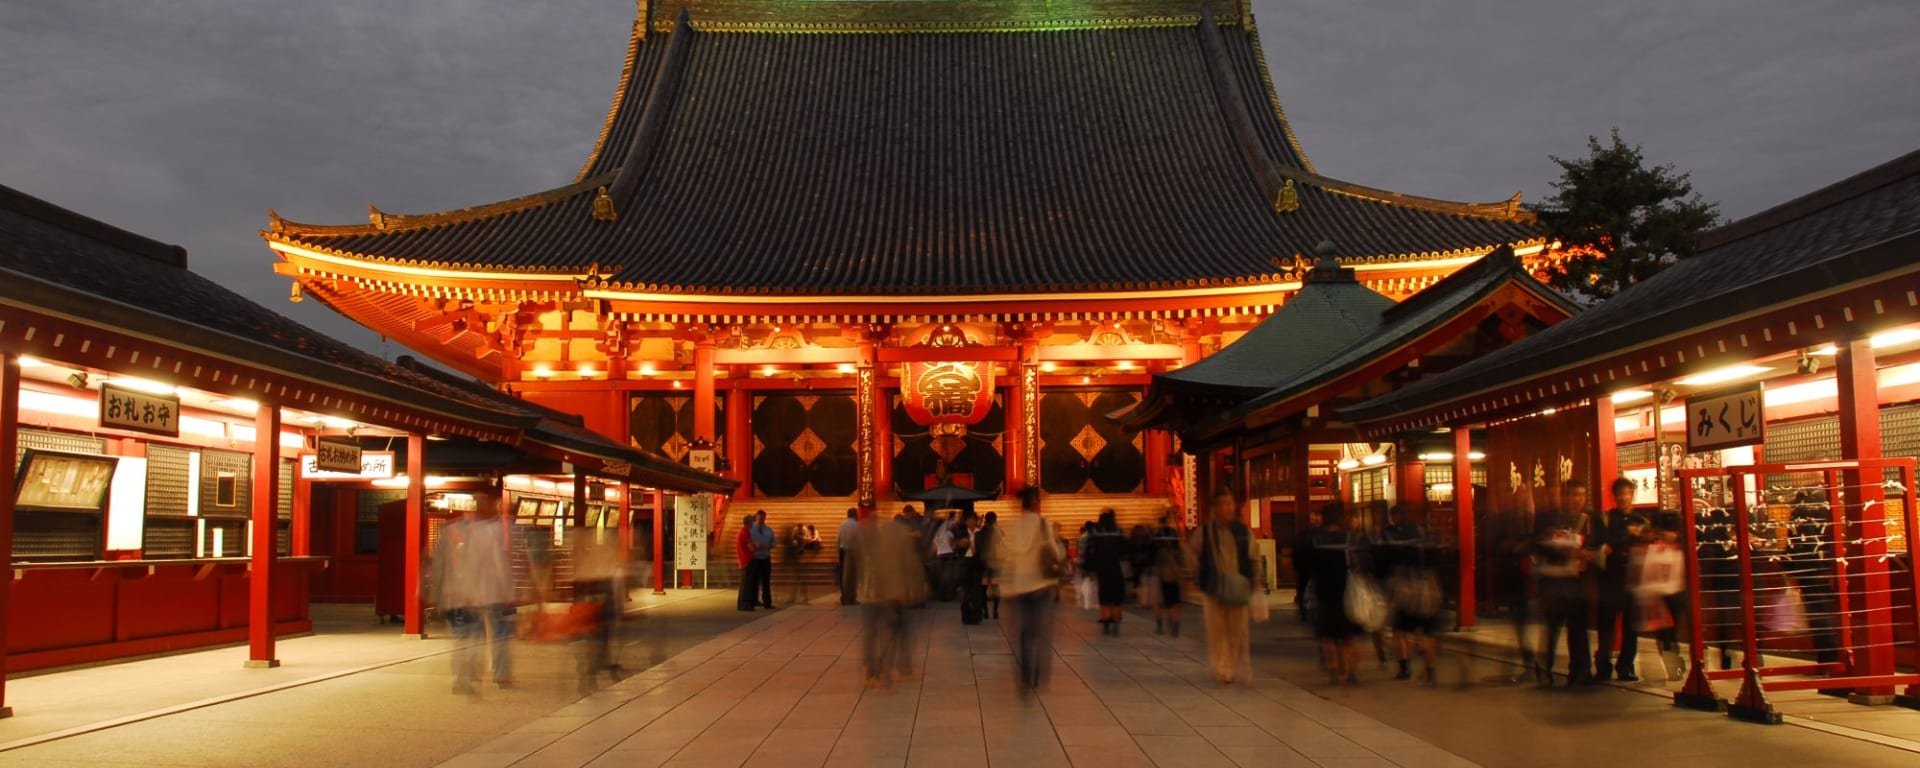 Highlights de Tokyo – demi-journée: Tokyo: Senso-ji (Kannon) Temple Asakusa